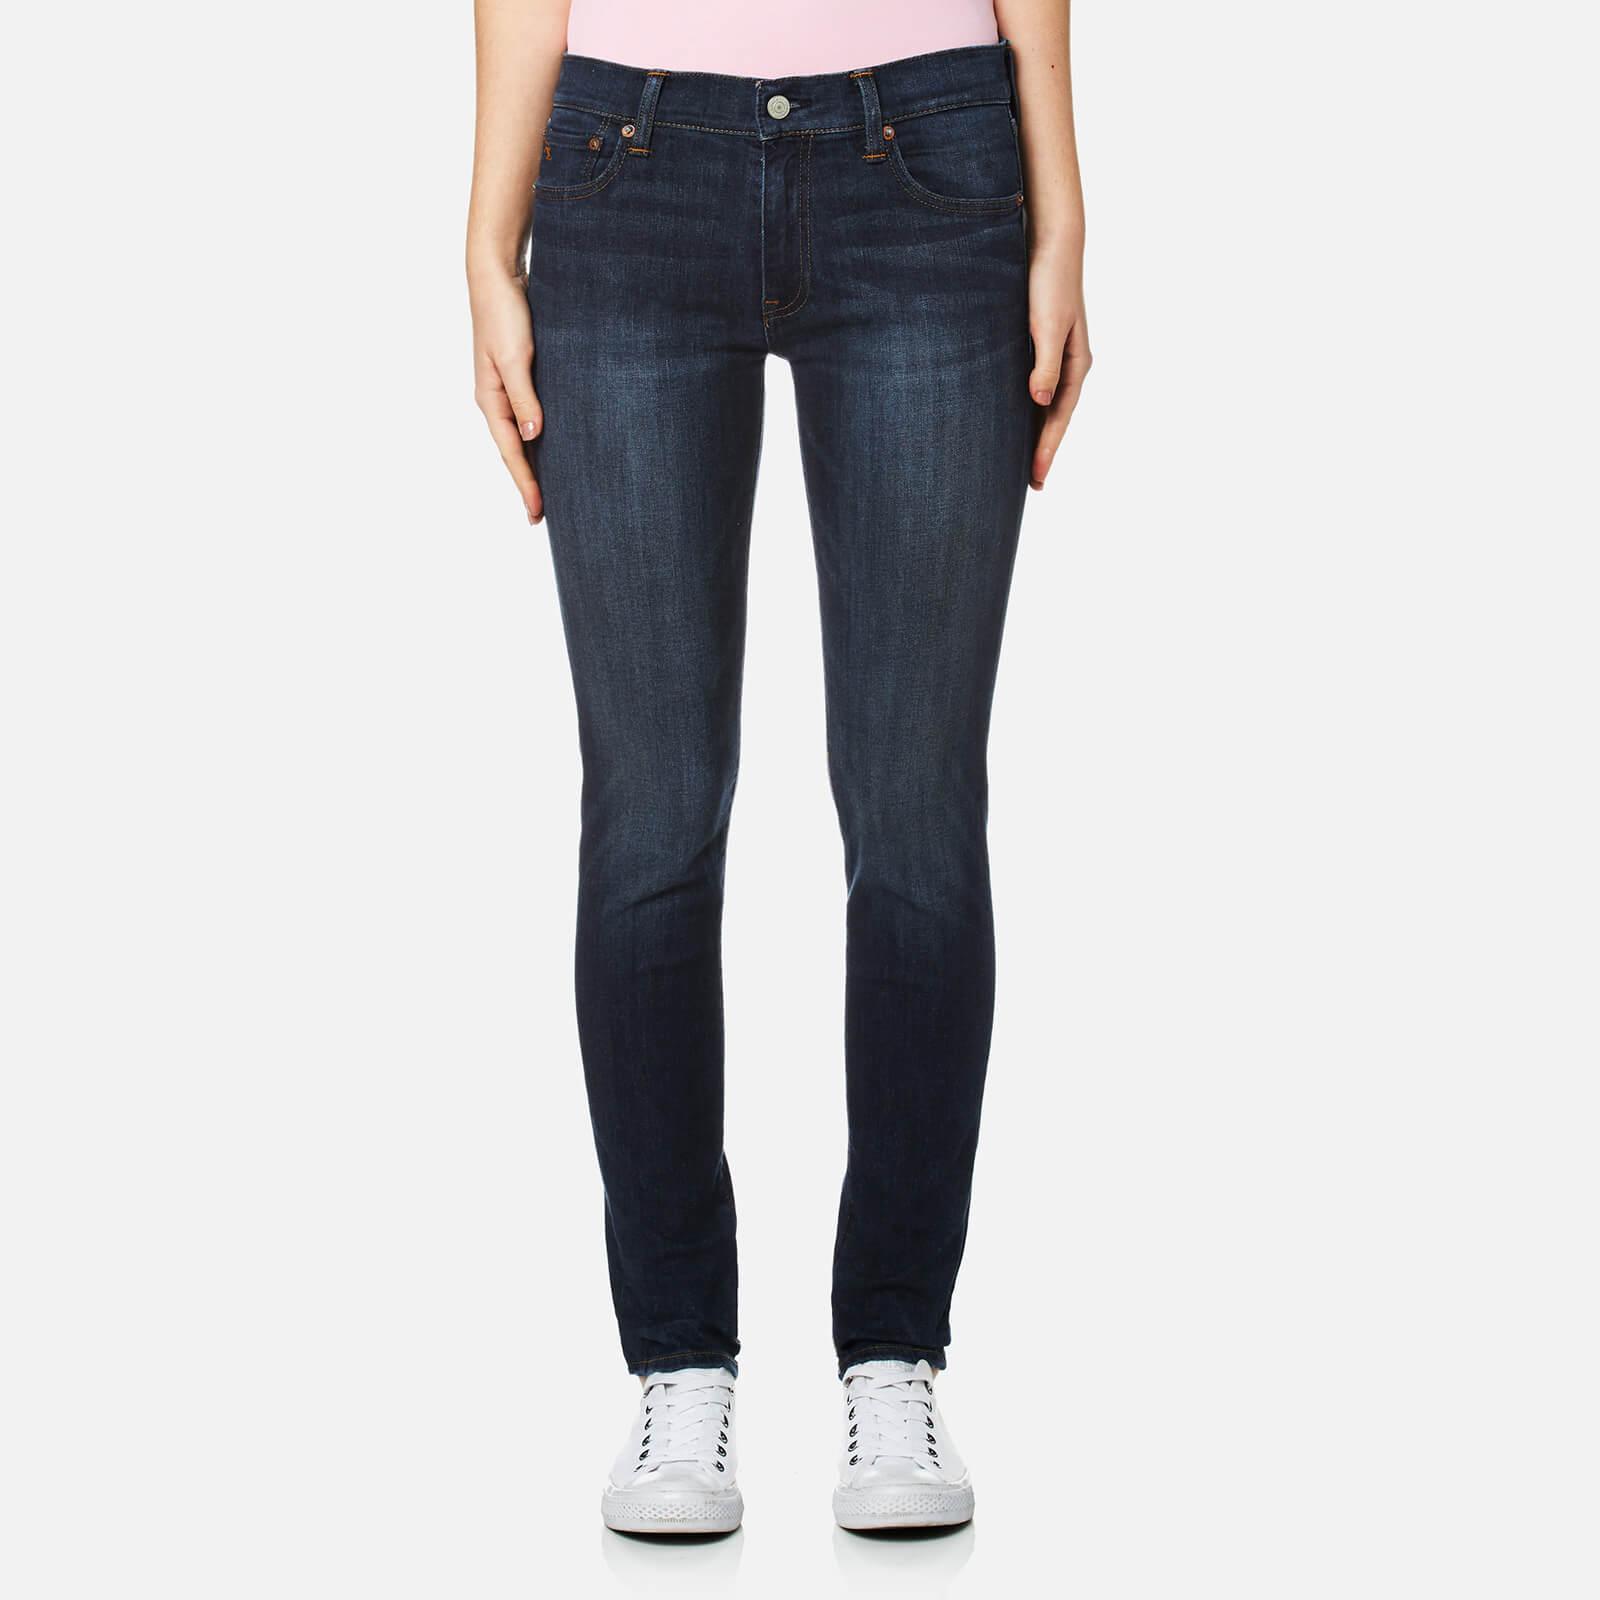 Ralph Tompkins Lauren Dark Jeans Polo Women's Indigo Skinny QxtrdBhCs